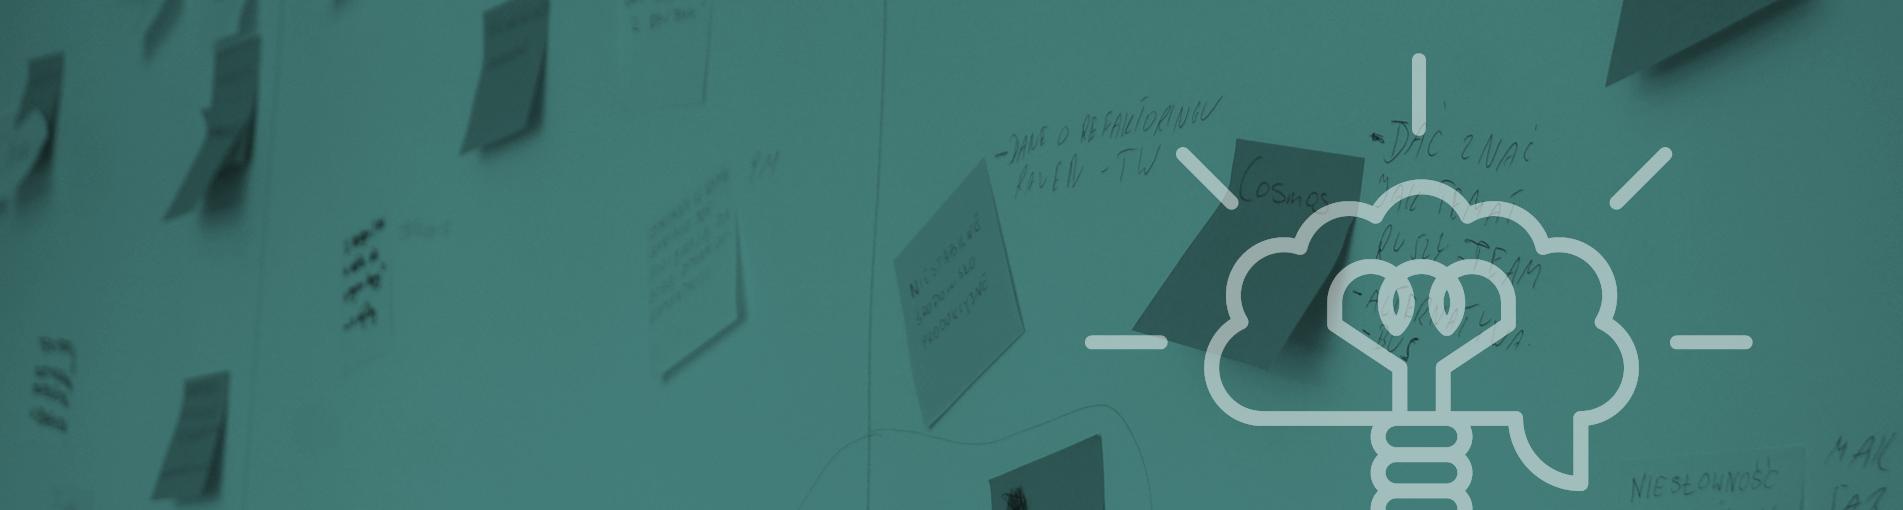 Creative workshops – Episode 1 – How to organize good workshops?